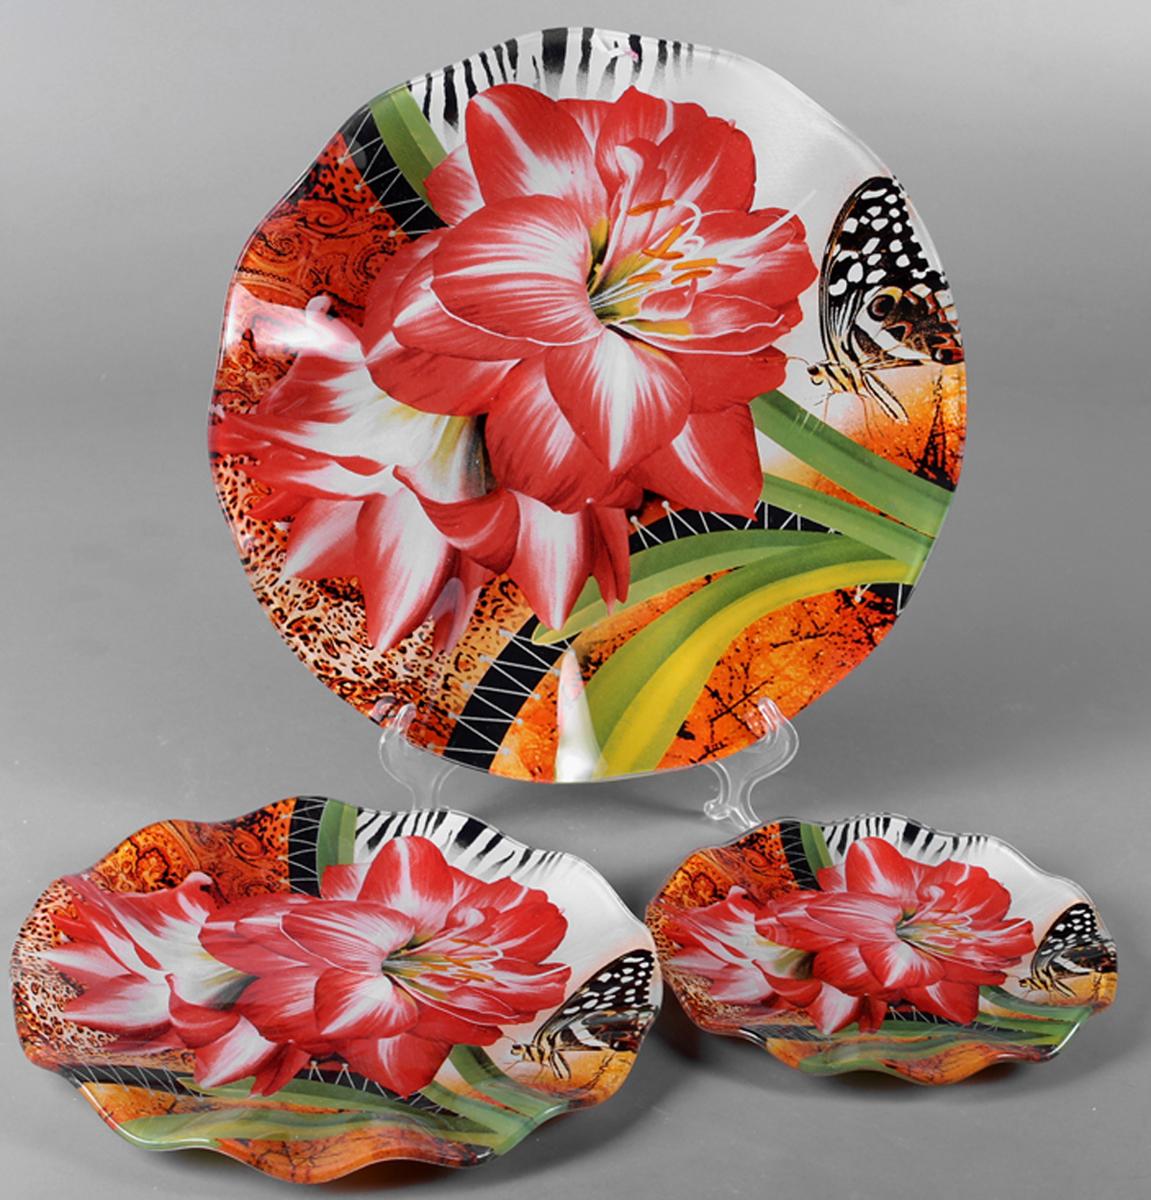 Набор блюд Olaff Цветы, 3 предмета. ZY-MD-TSYB-794 фруктовница olaff цветы 2 яруса zy md ecyb 794